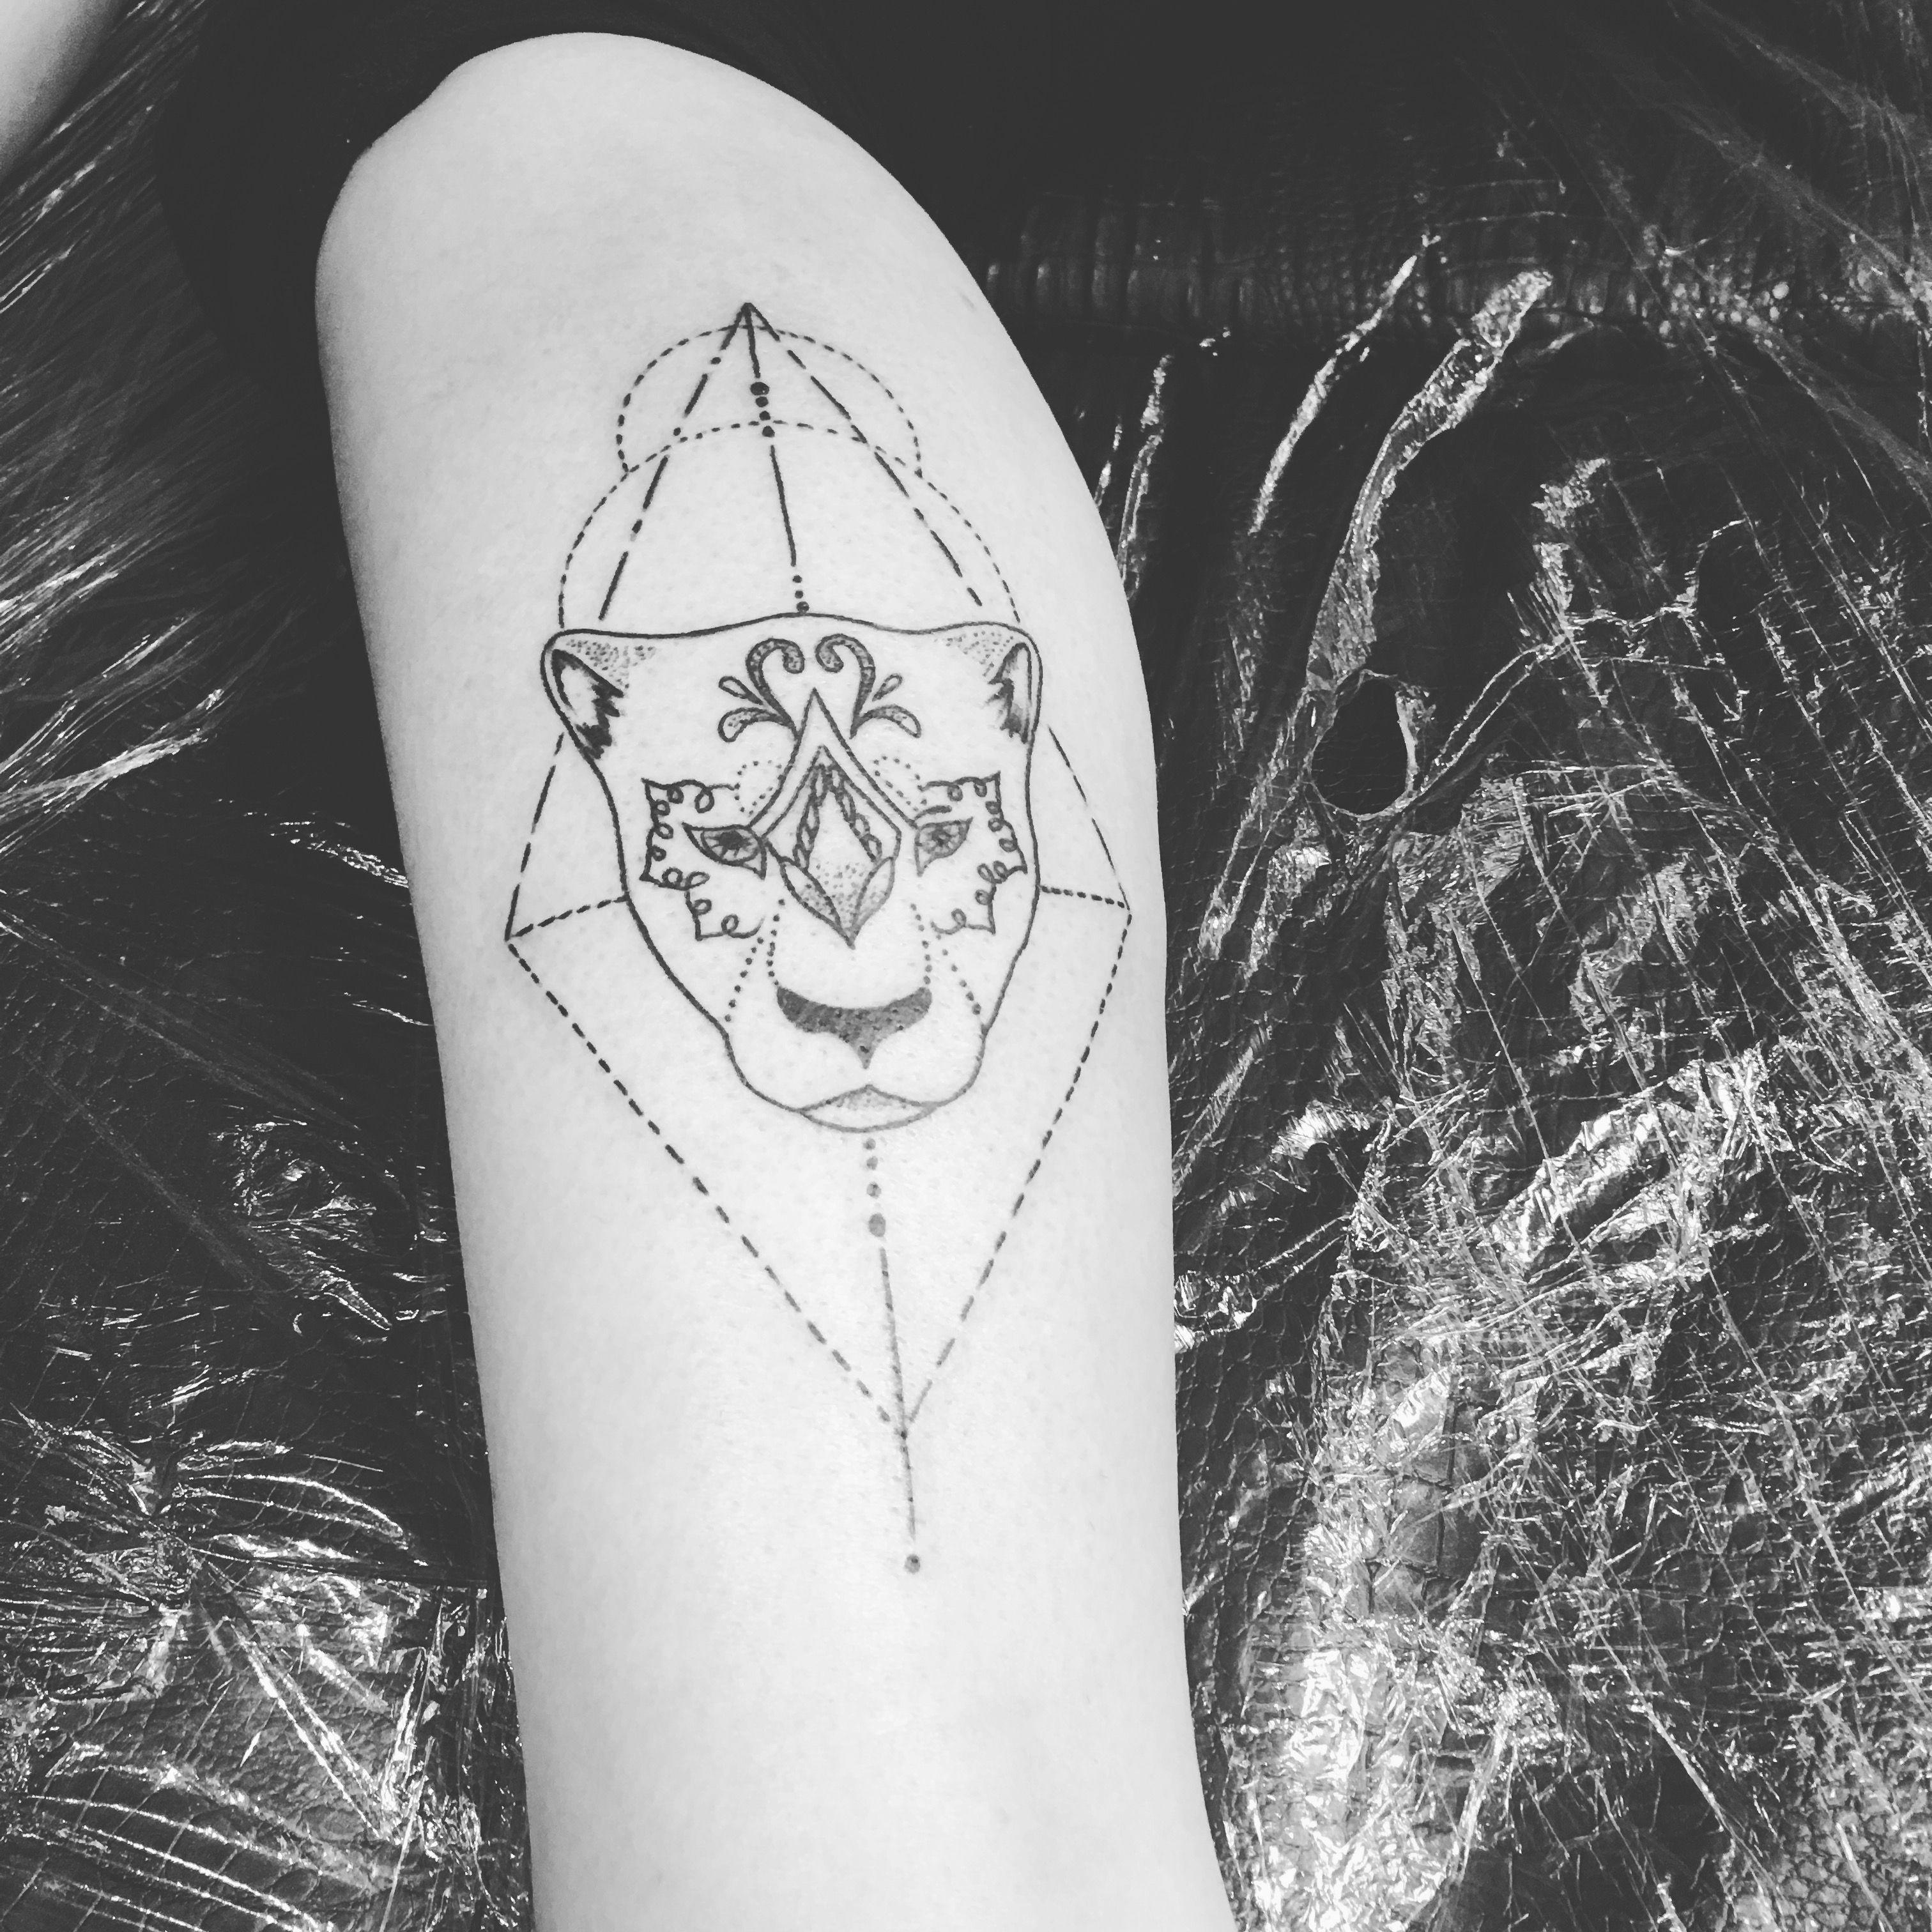 Pin By תומאס דניאל On Dream Dream Catcher Tattoo By Tomas Daniel Tattoo Artist From Israel 0505564600 Geometric Tattoo Daniel Tattoo Tattoo Artists